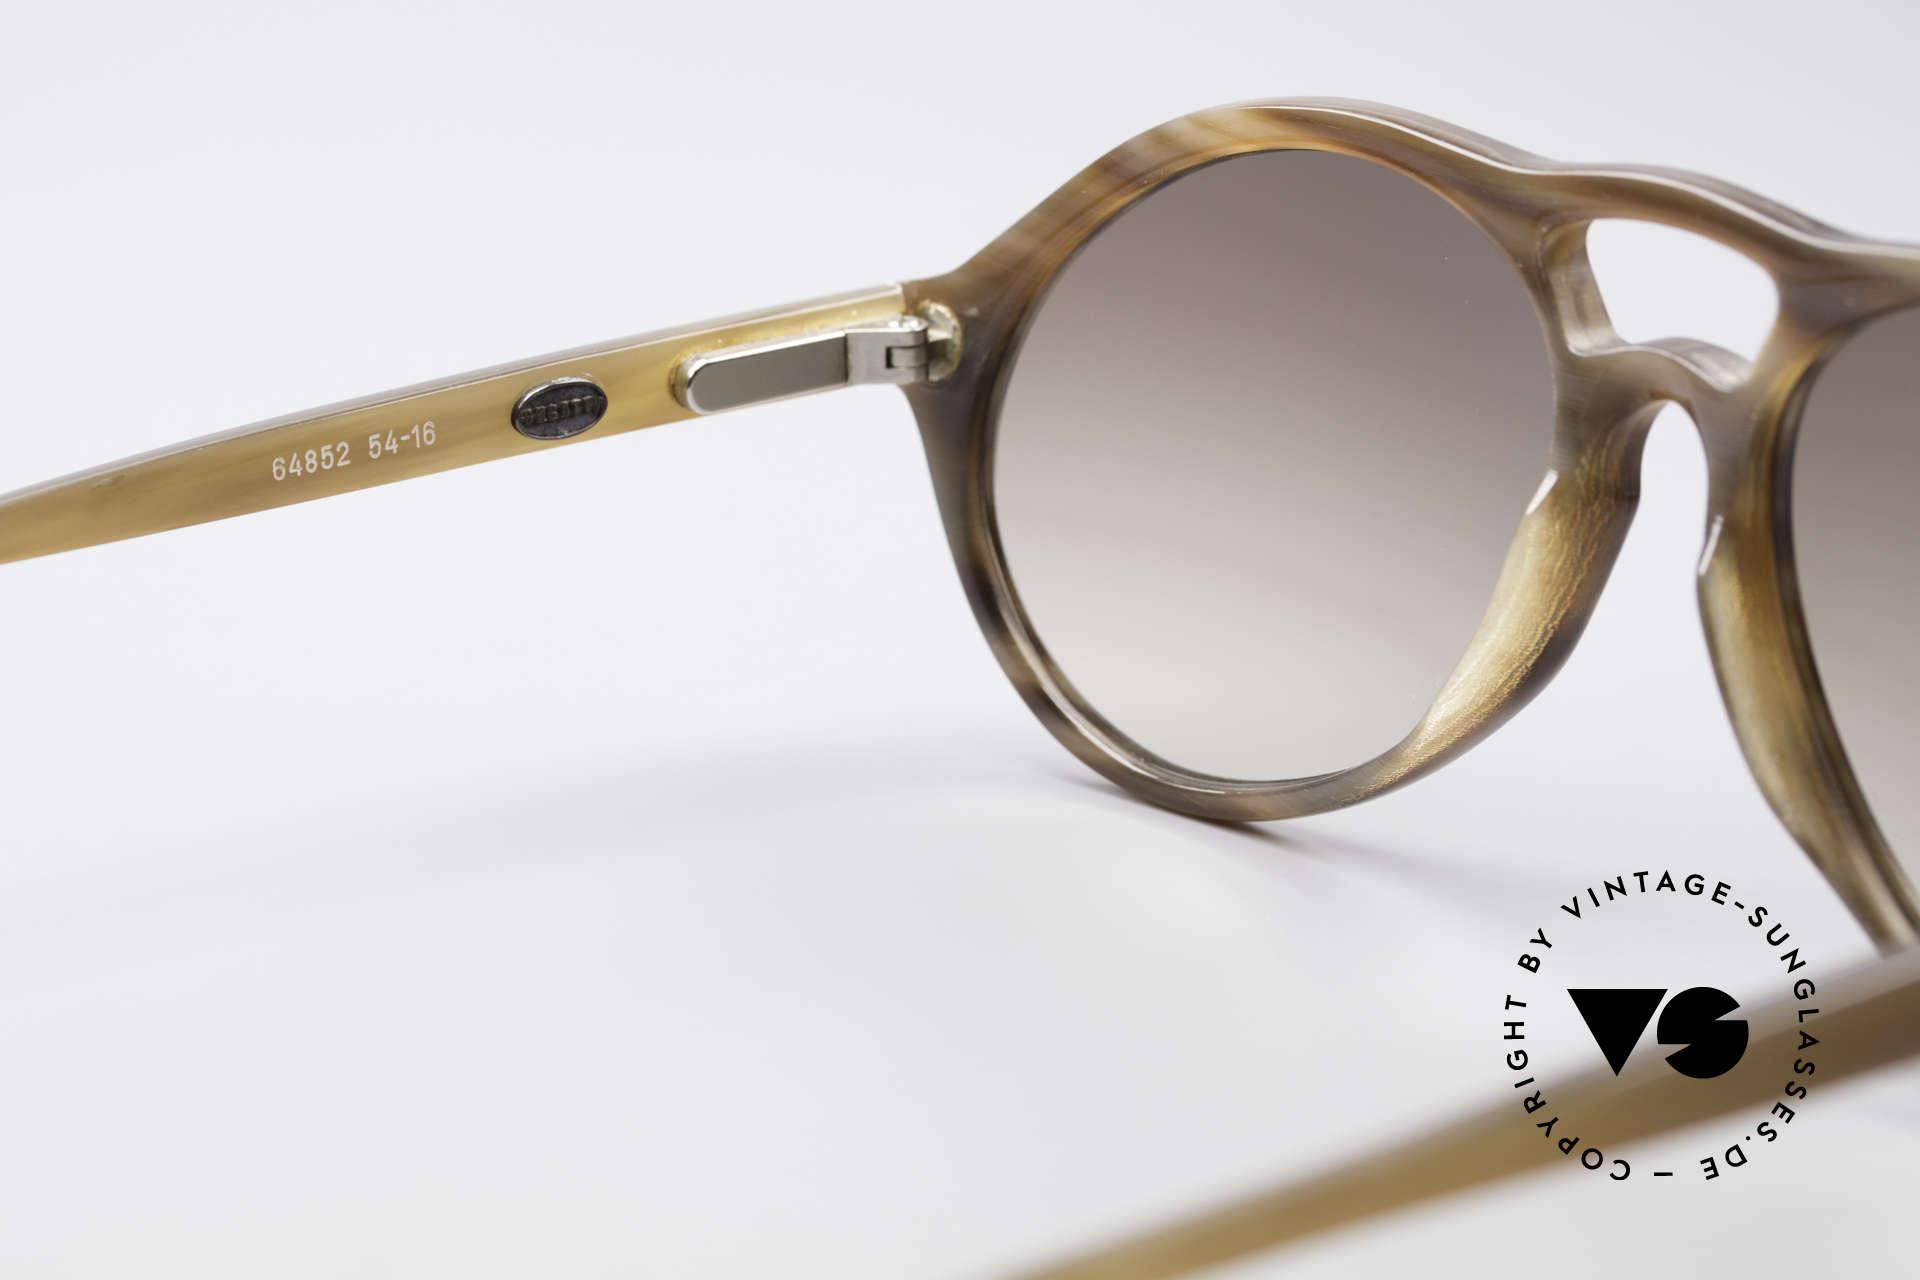 Bugatti 64852 Genuine Buffalo Horn Glasses, unworn (like all our BUGATTI gentlemen's sunglasses), Made for Men